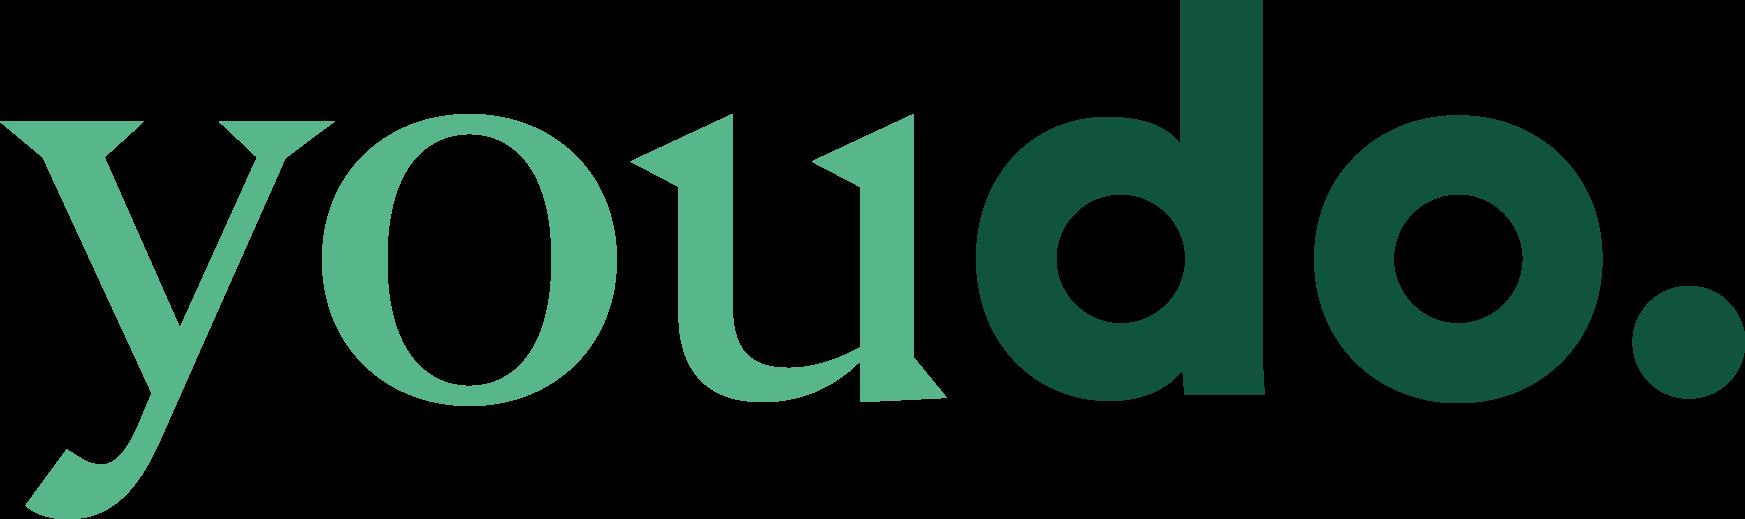 youdo Logo Karrierebegleitung online kostenlos digital